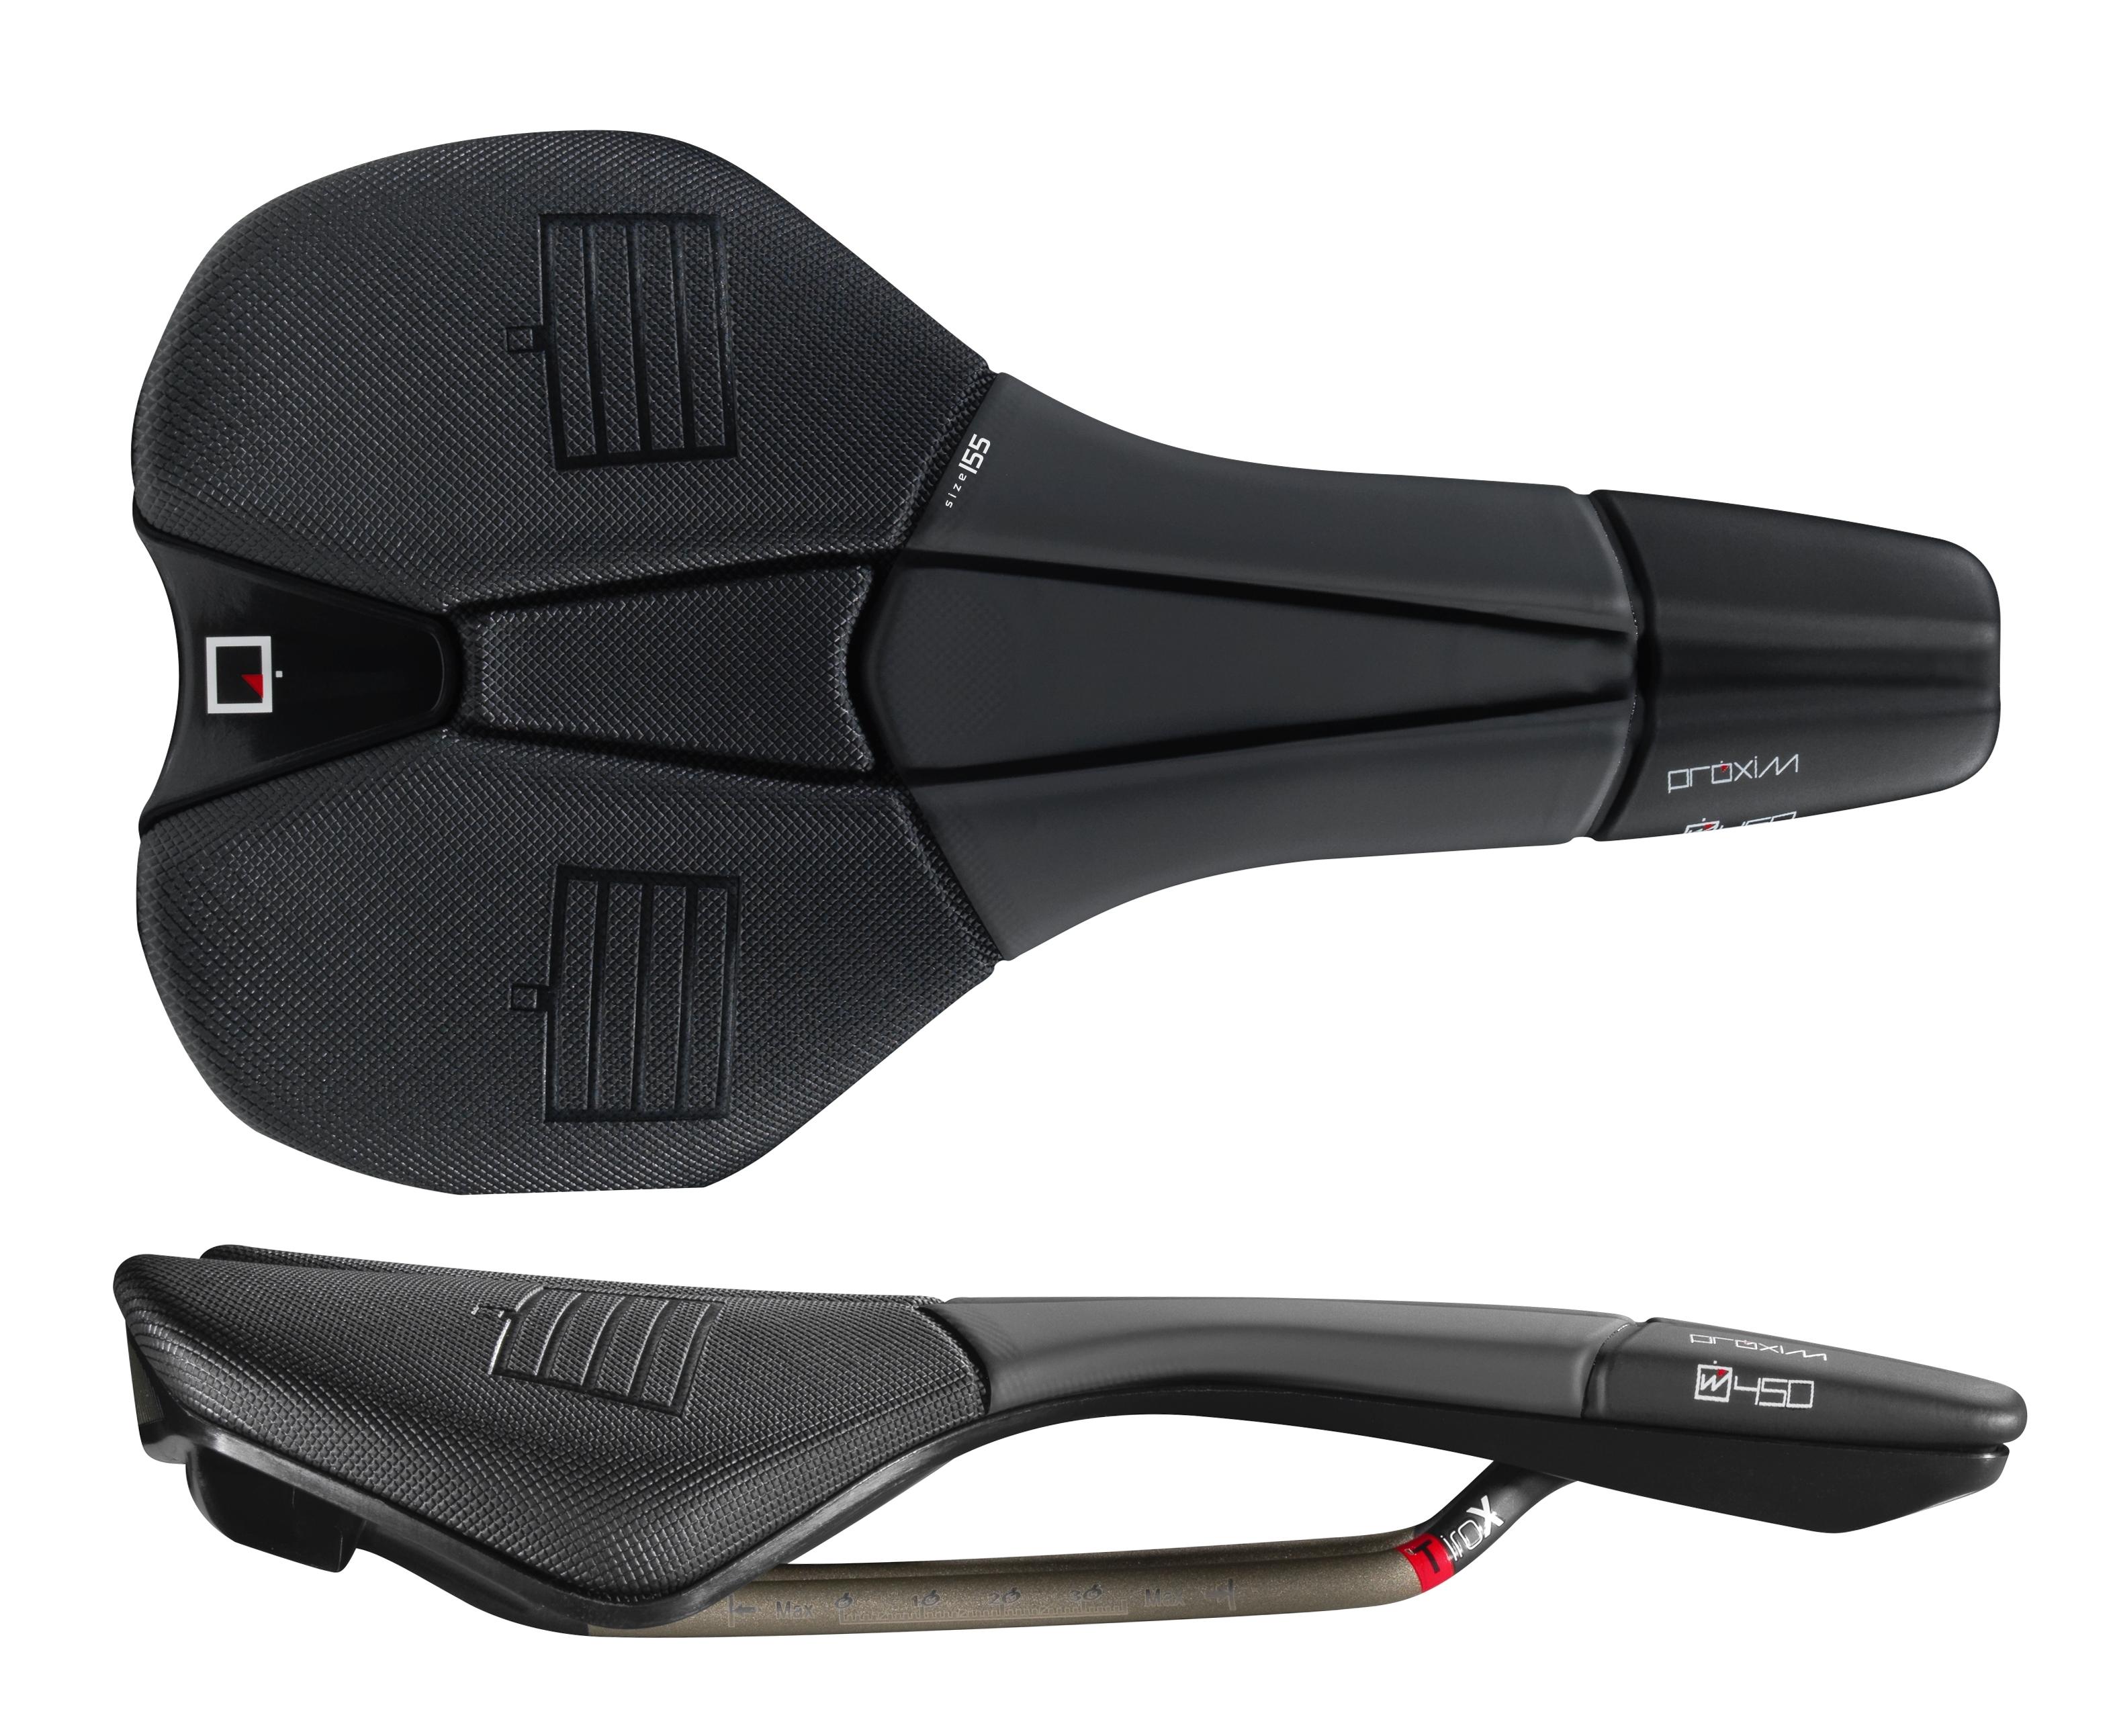 sedlo PROLOGO PROXIM W450 TIROX 155 černé